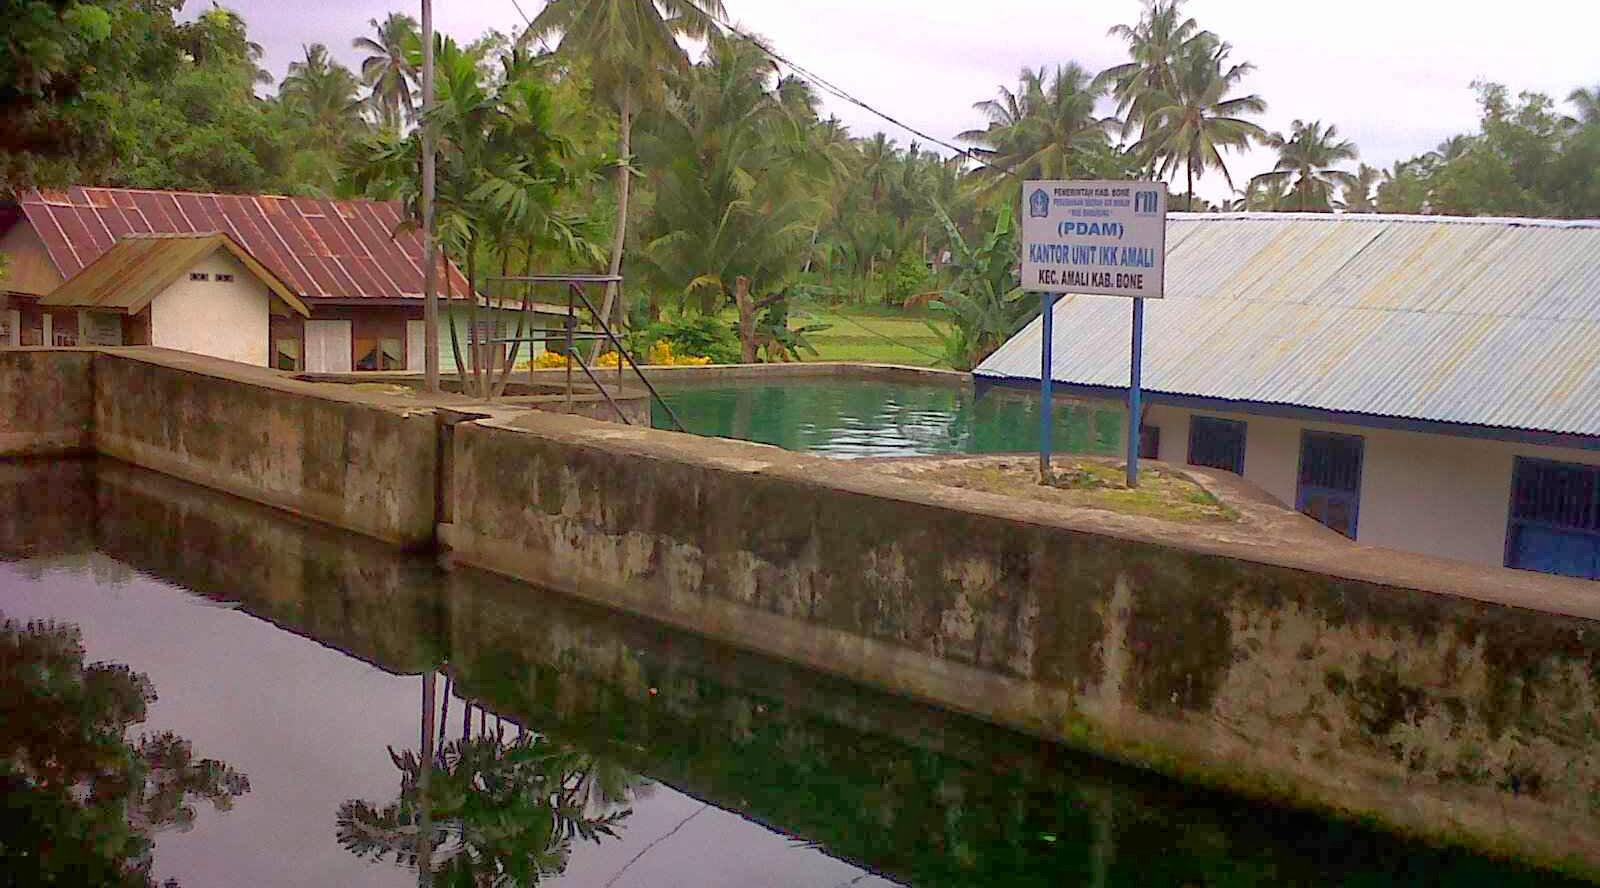 Wisata Mandi air di Taretta Bone desa Amali